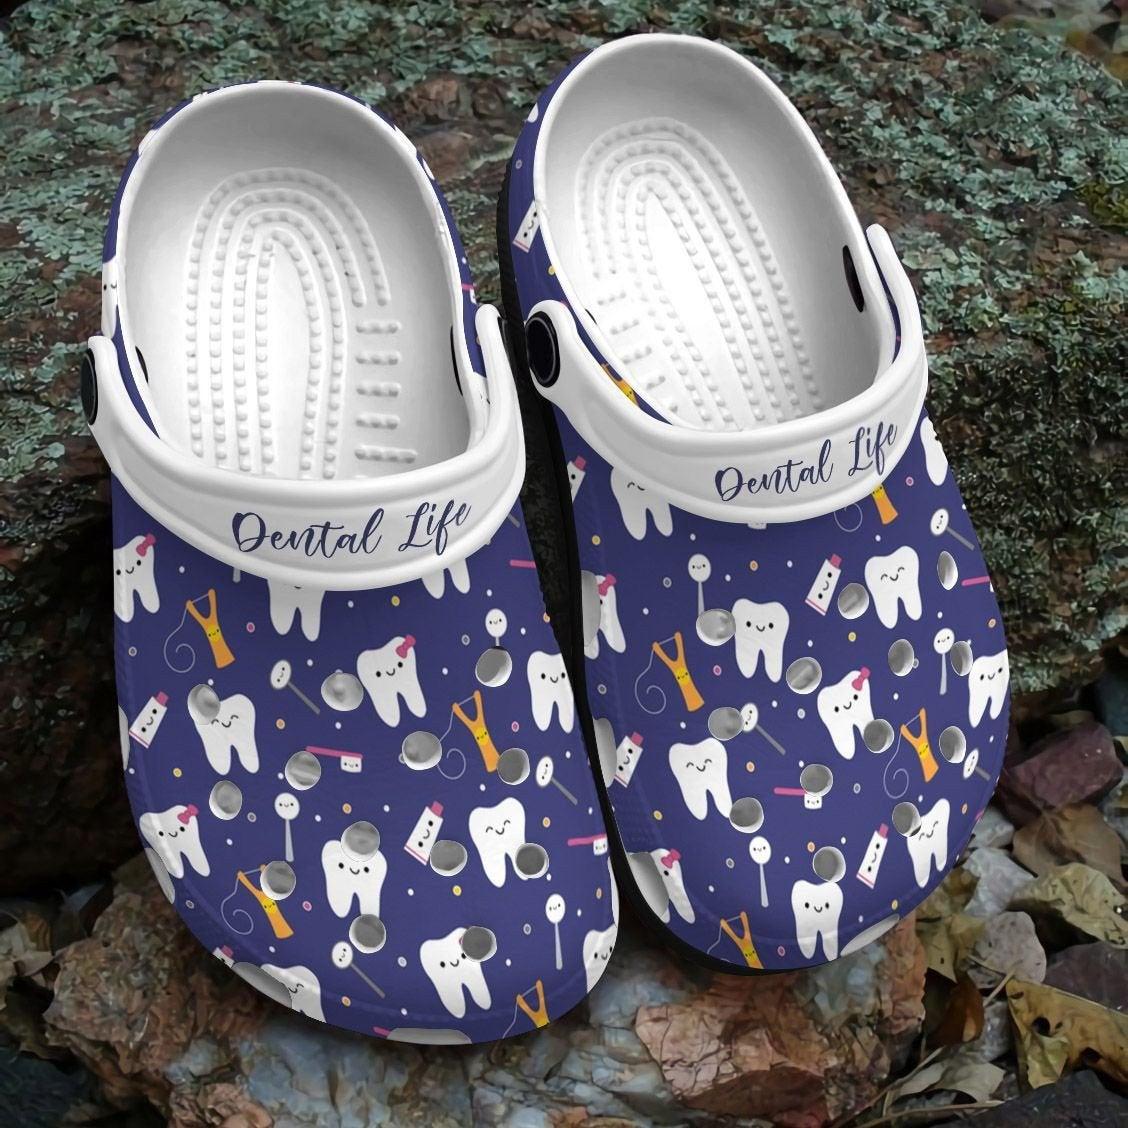 Dentist Dental Life Crocs Clog Shoes